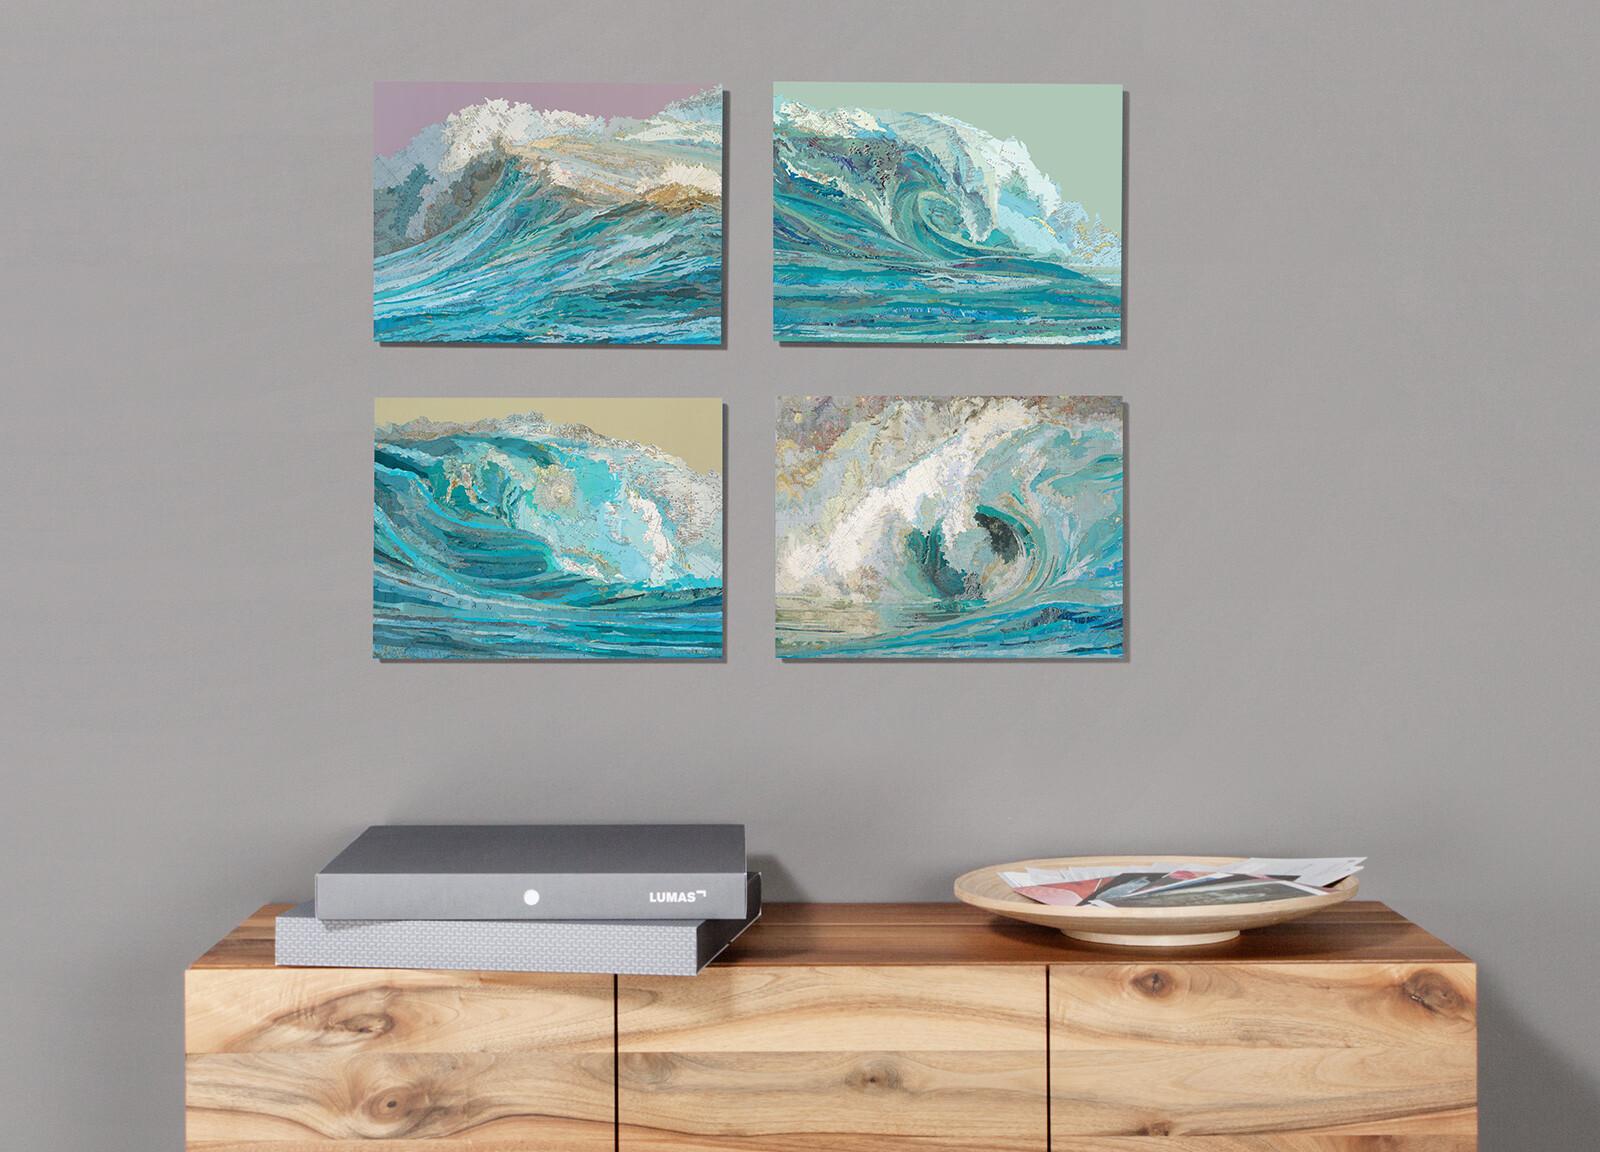 Fiona's Wave - Matthew Cusick